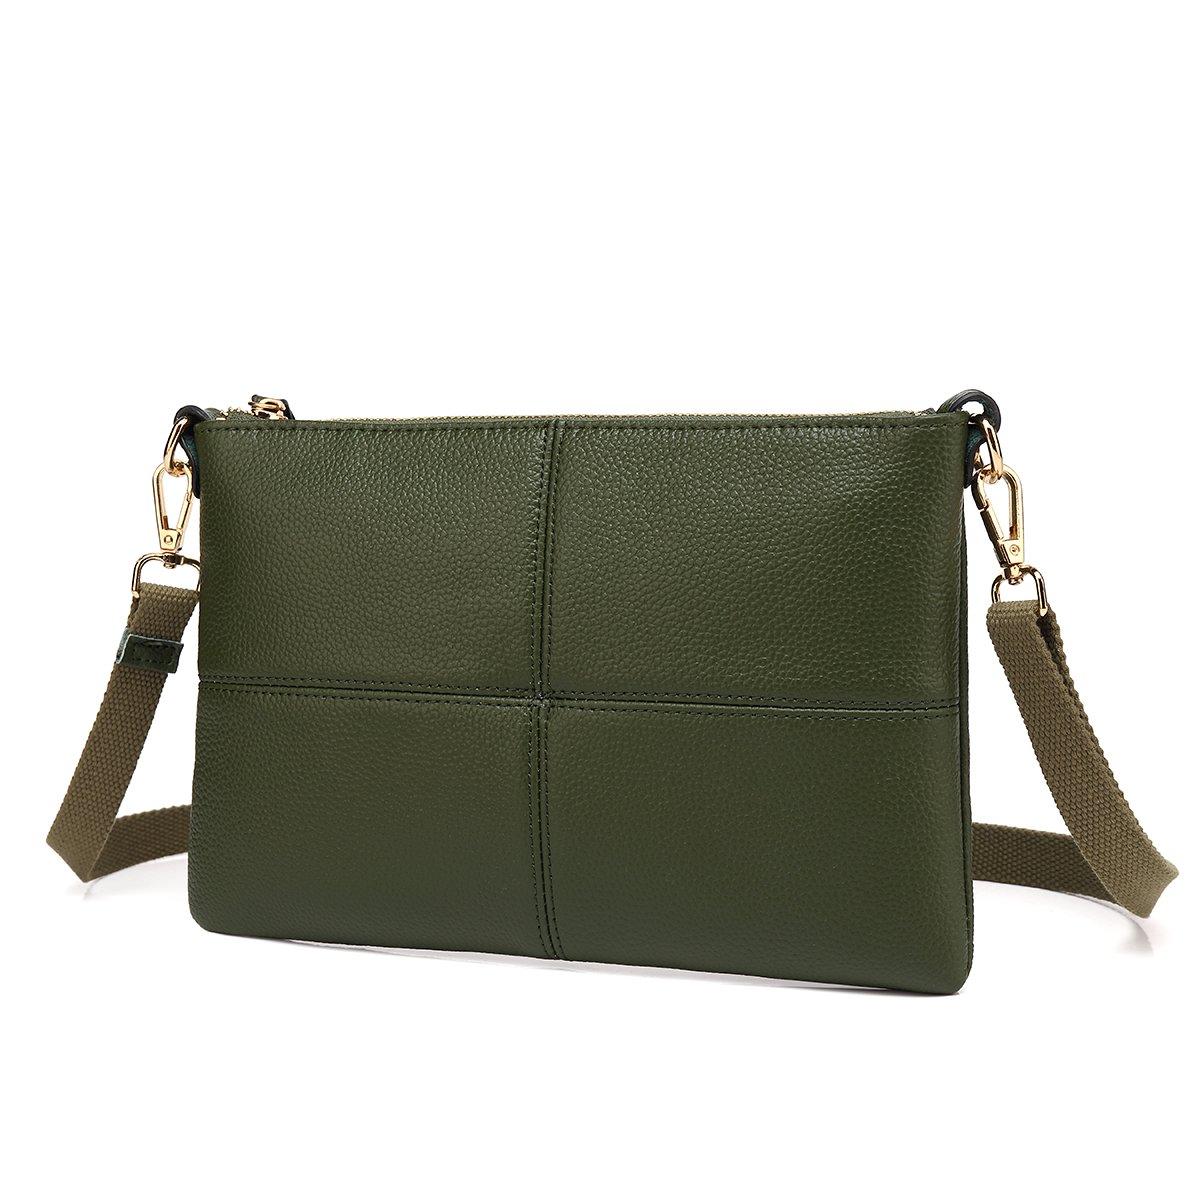 Women Leather Crossbody Bag,Clutch Purse Shoulder Bag for Travelling Dark Green by Galaxy Wolf